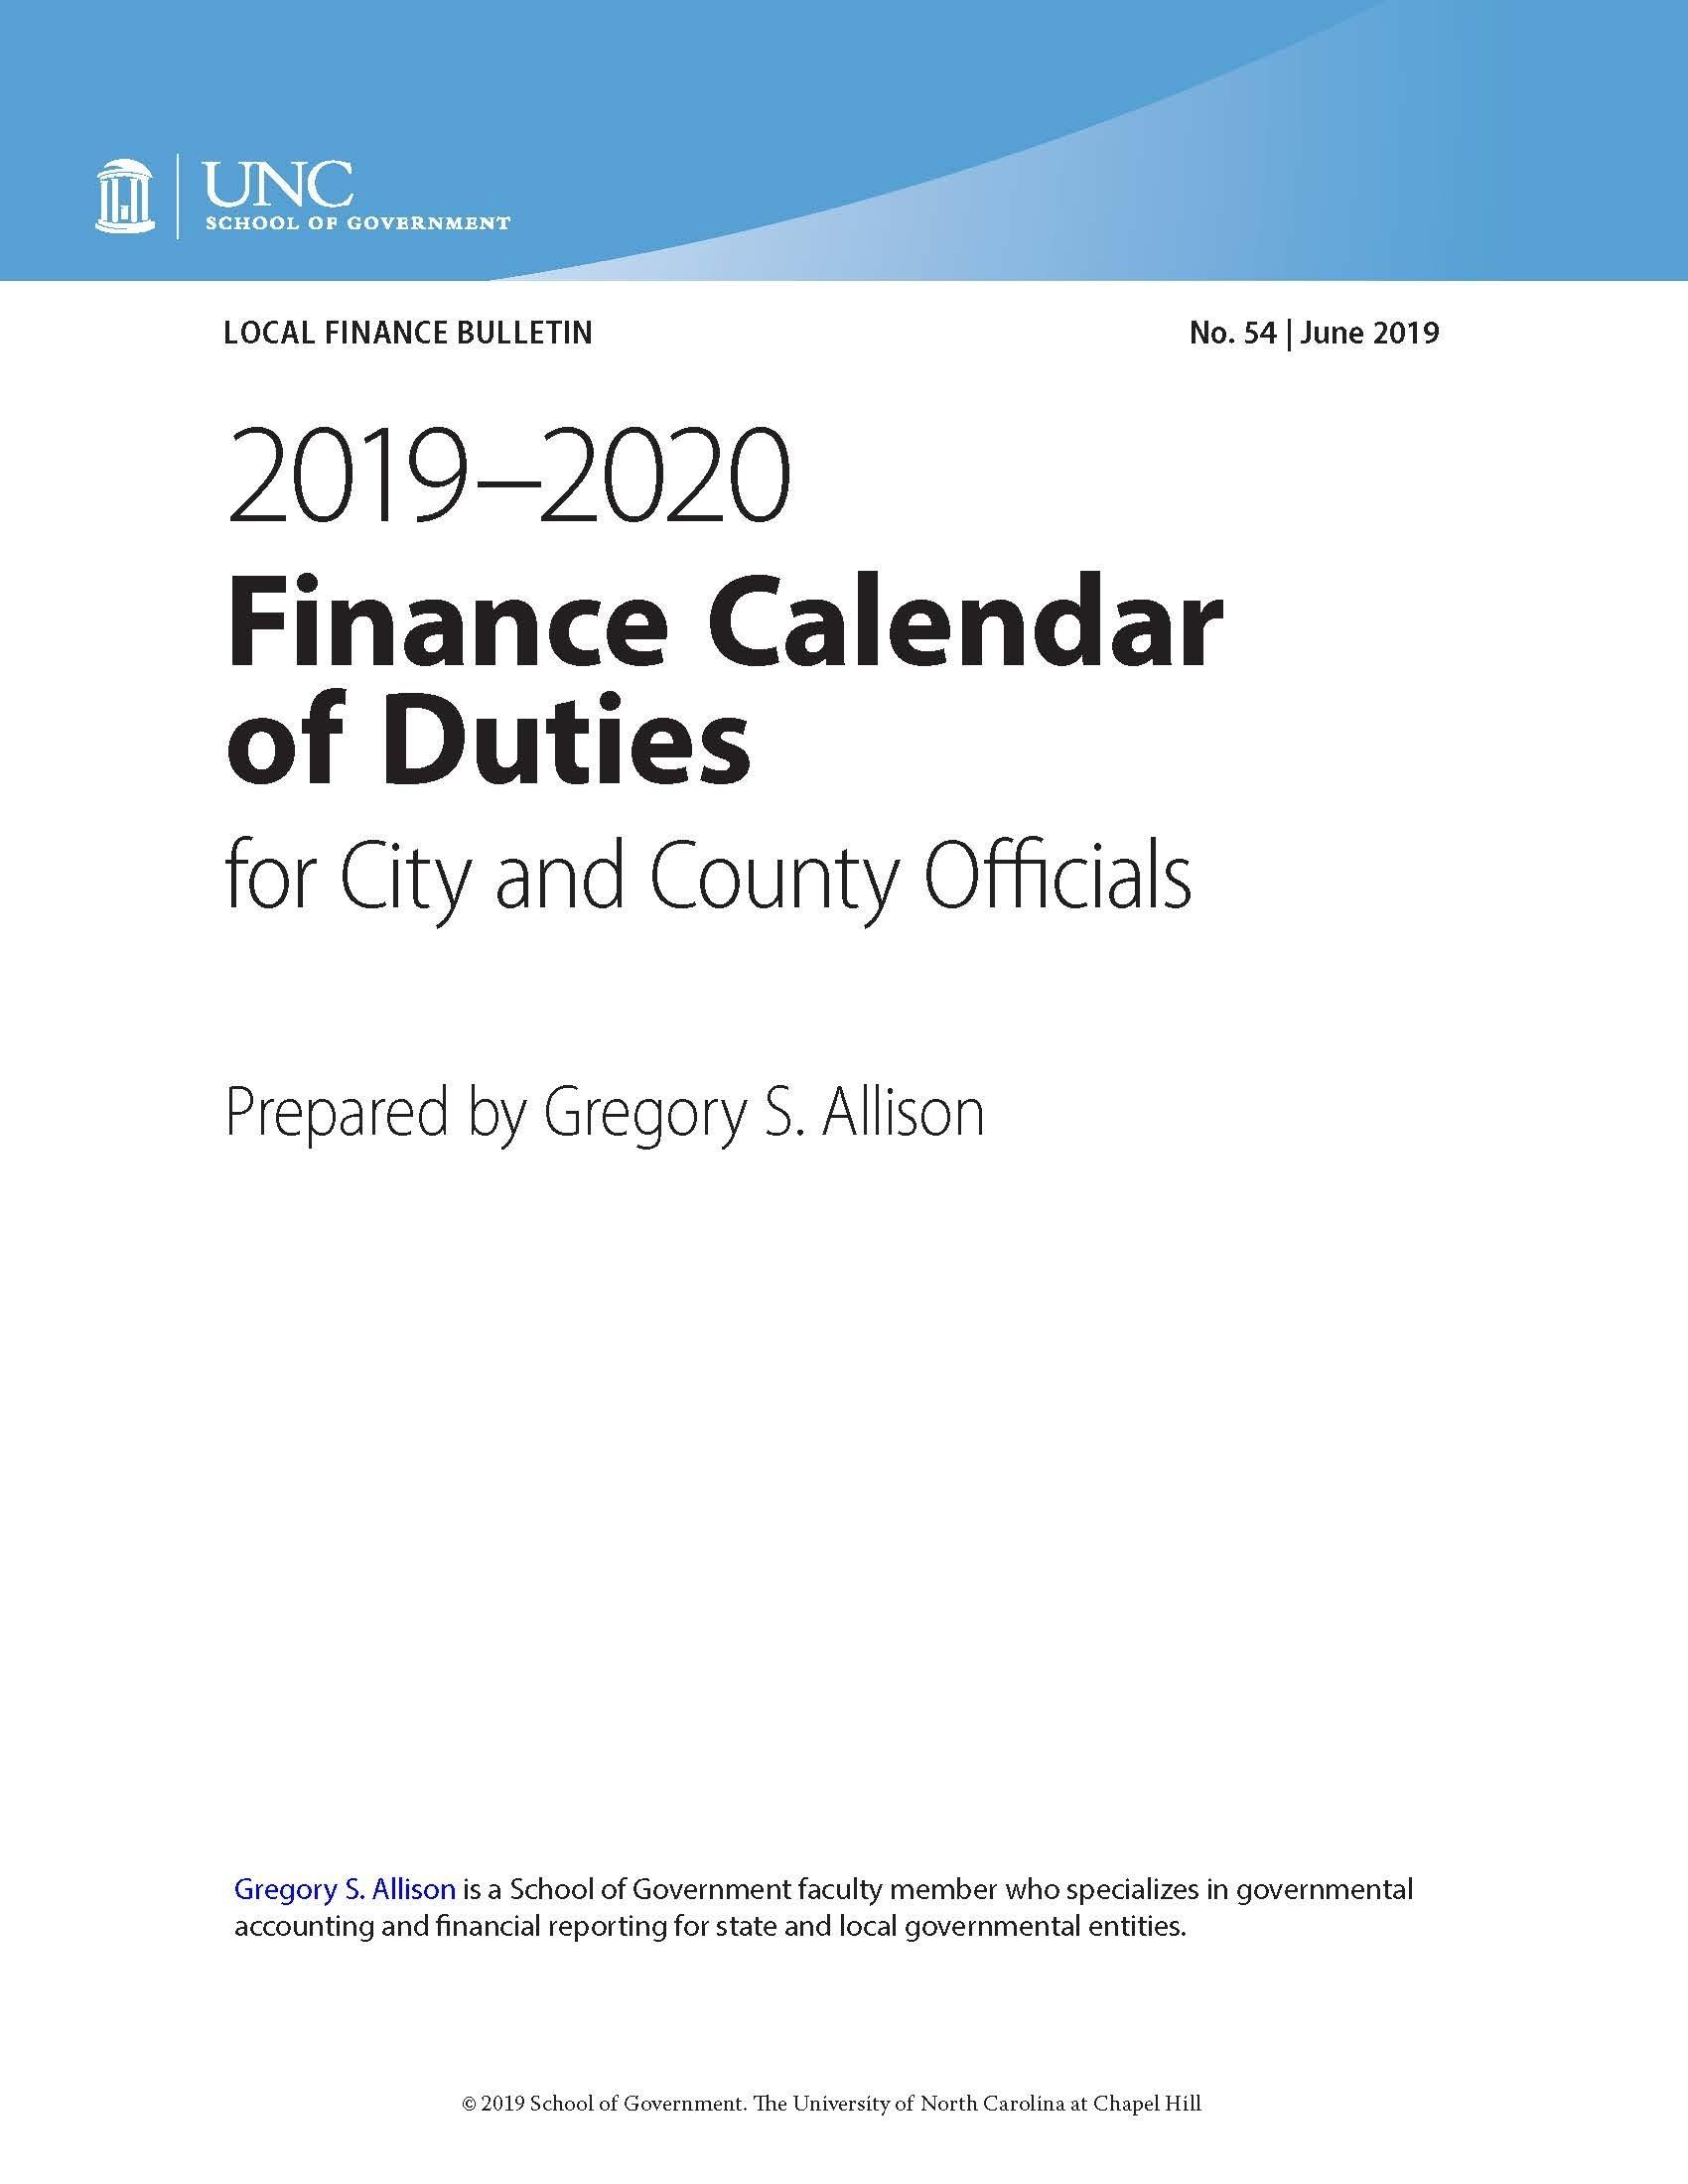 2019-2020 Finance Calendar Of Duties For City And County Officials_U City School Calendar